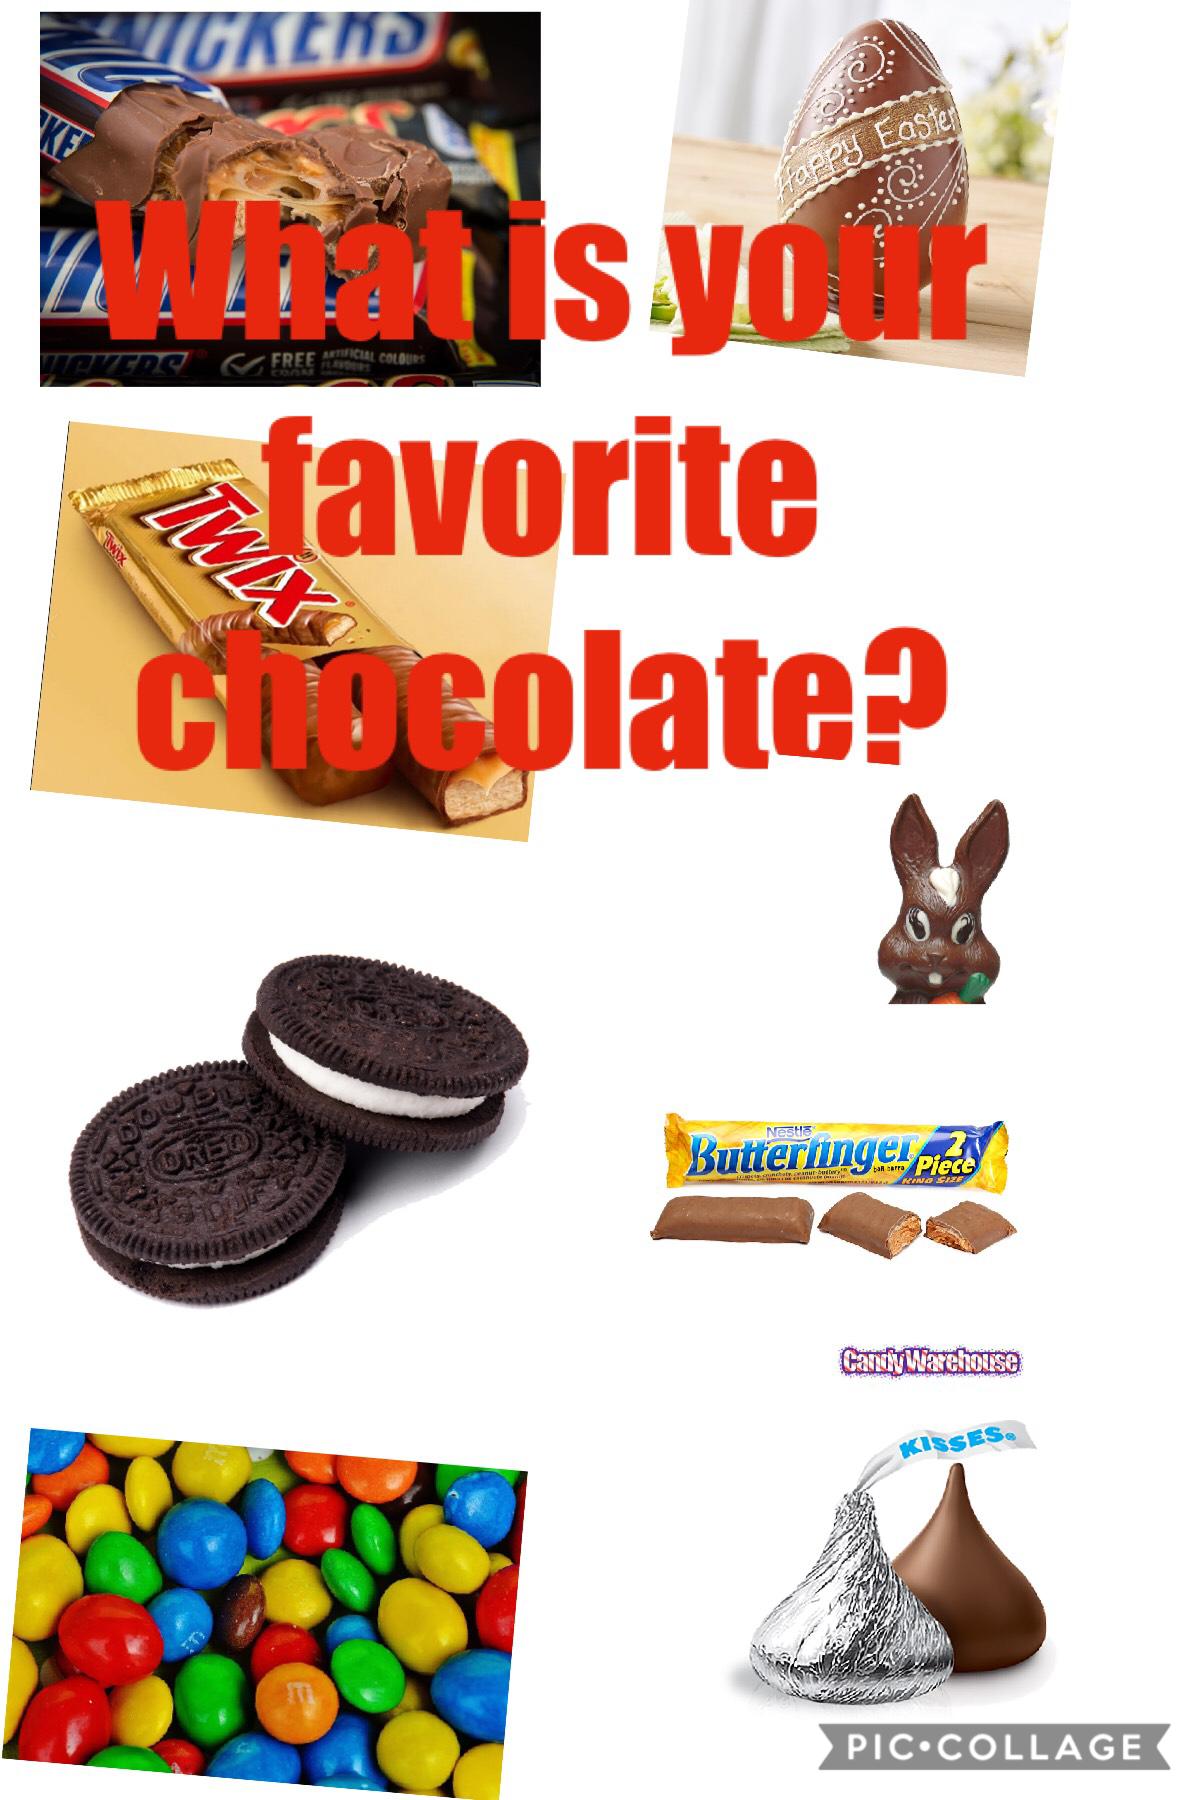 My favorite chocolate is Twix